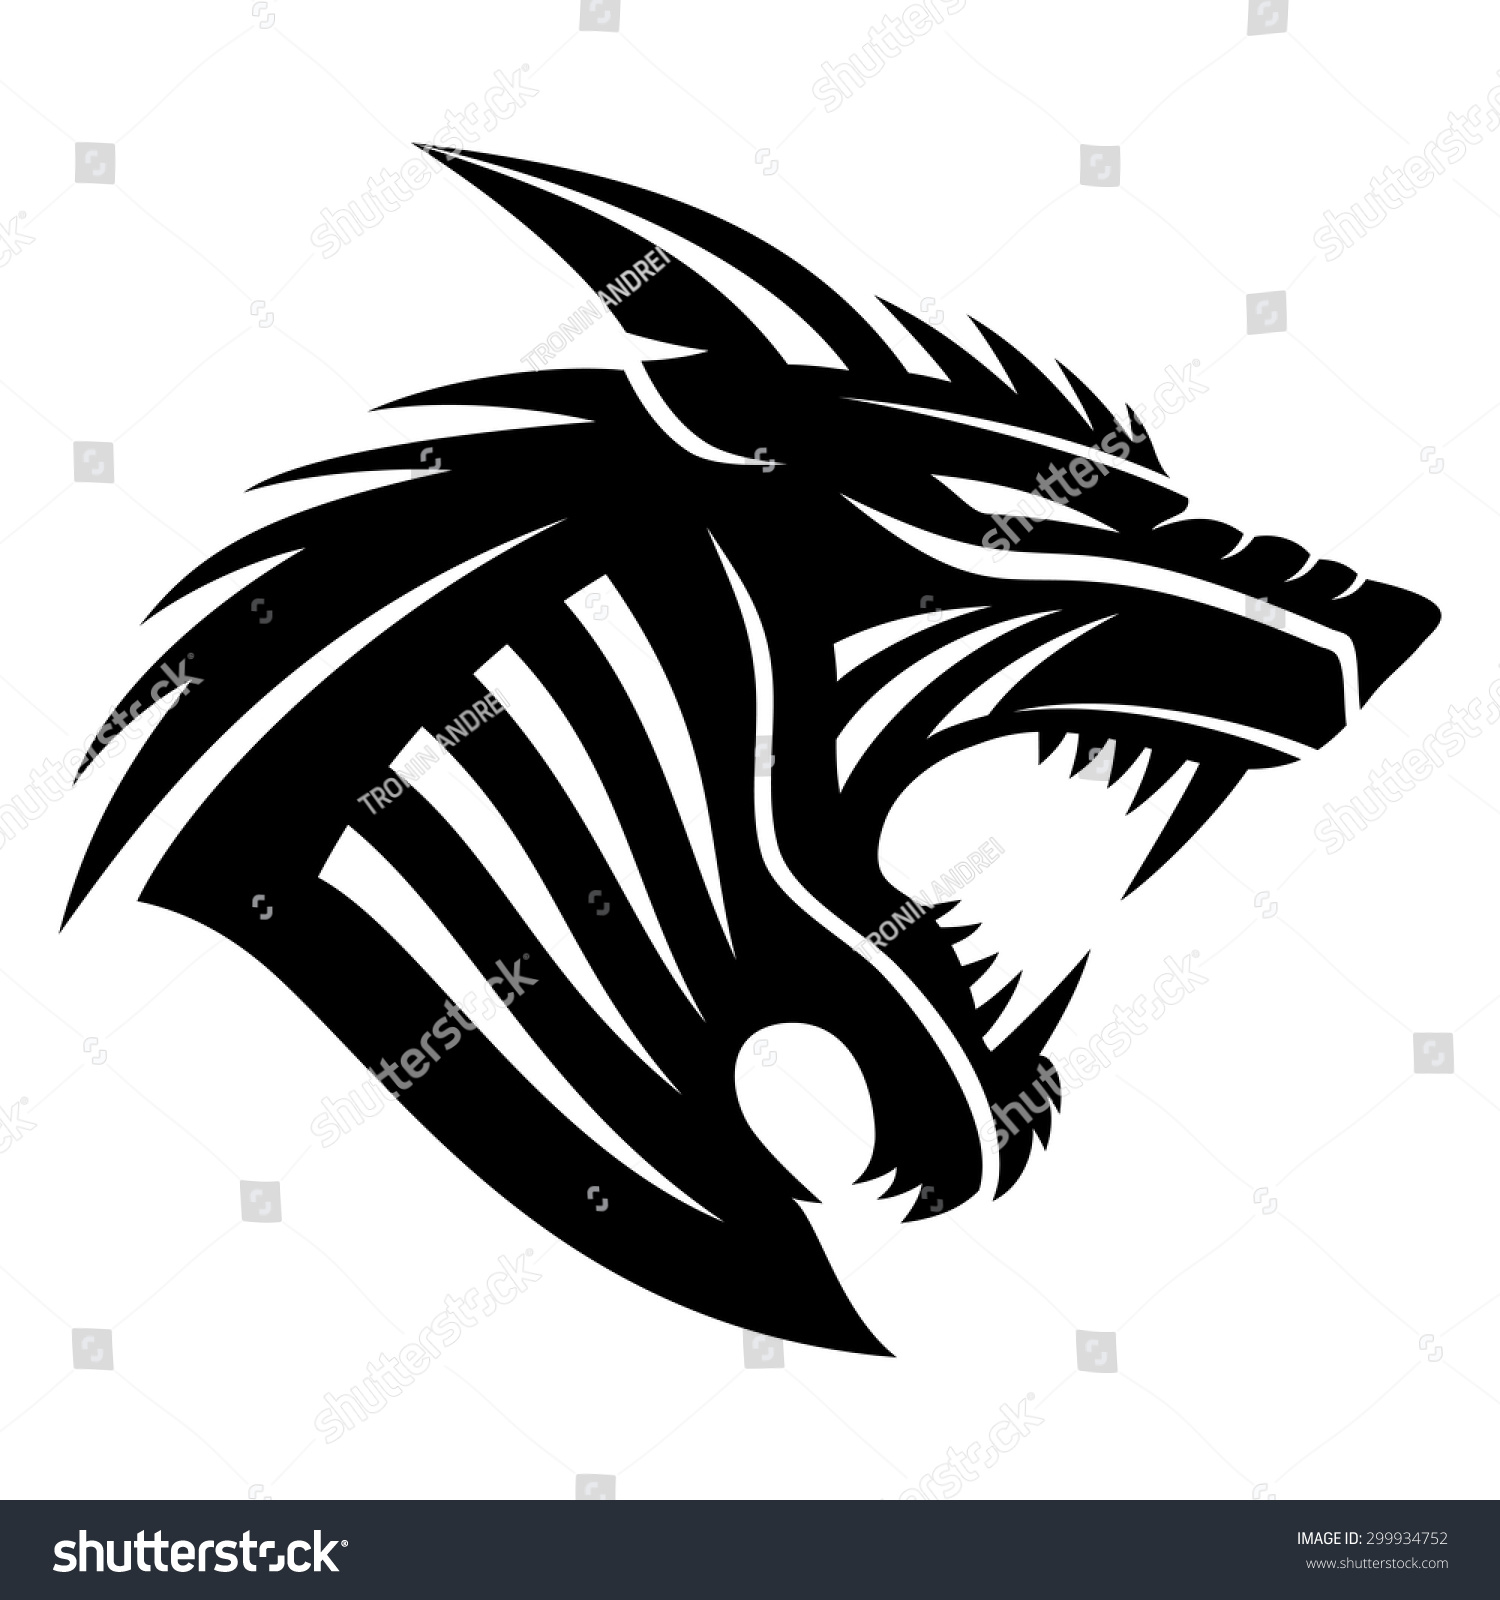 Werewolf Symbols